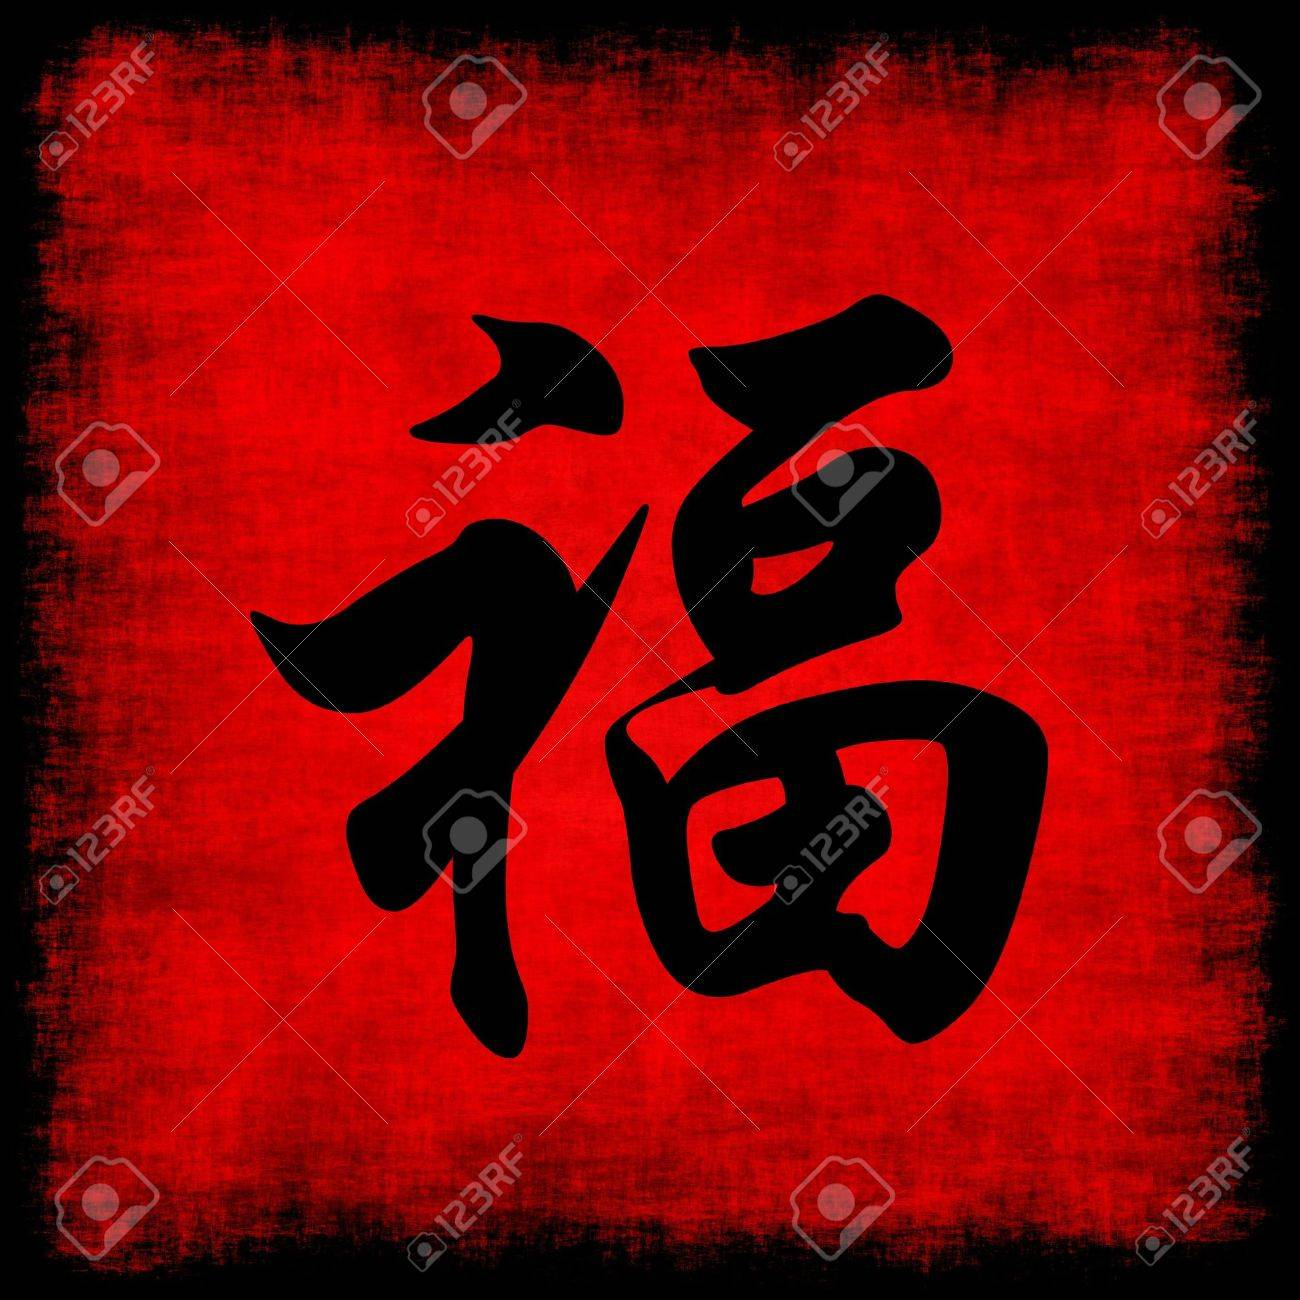 Wealth chinese calligraphy symbol grunge background set stock wealth chinese calligraphy symbol grunge background set stock photo 6188125 buycottarizona Choice Image